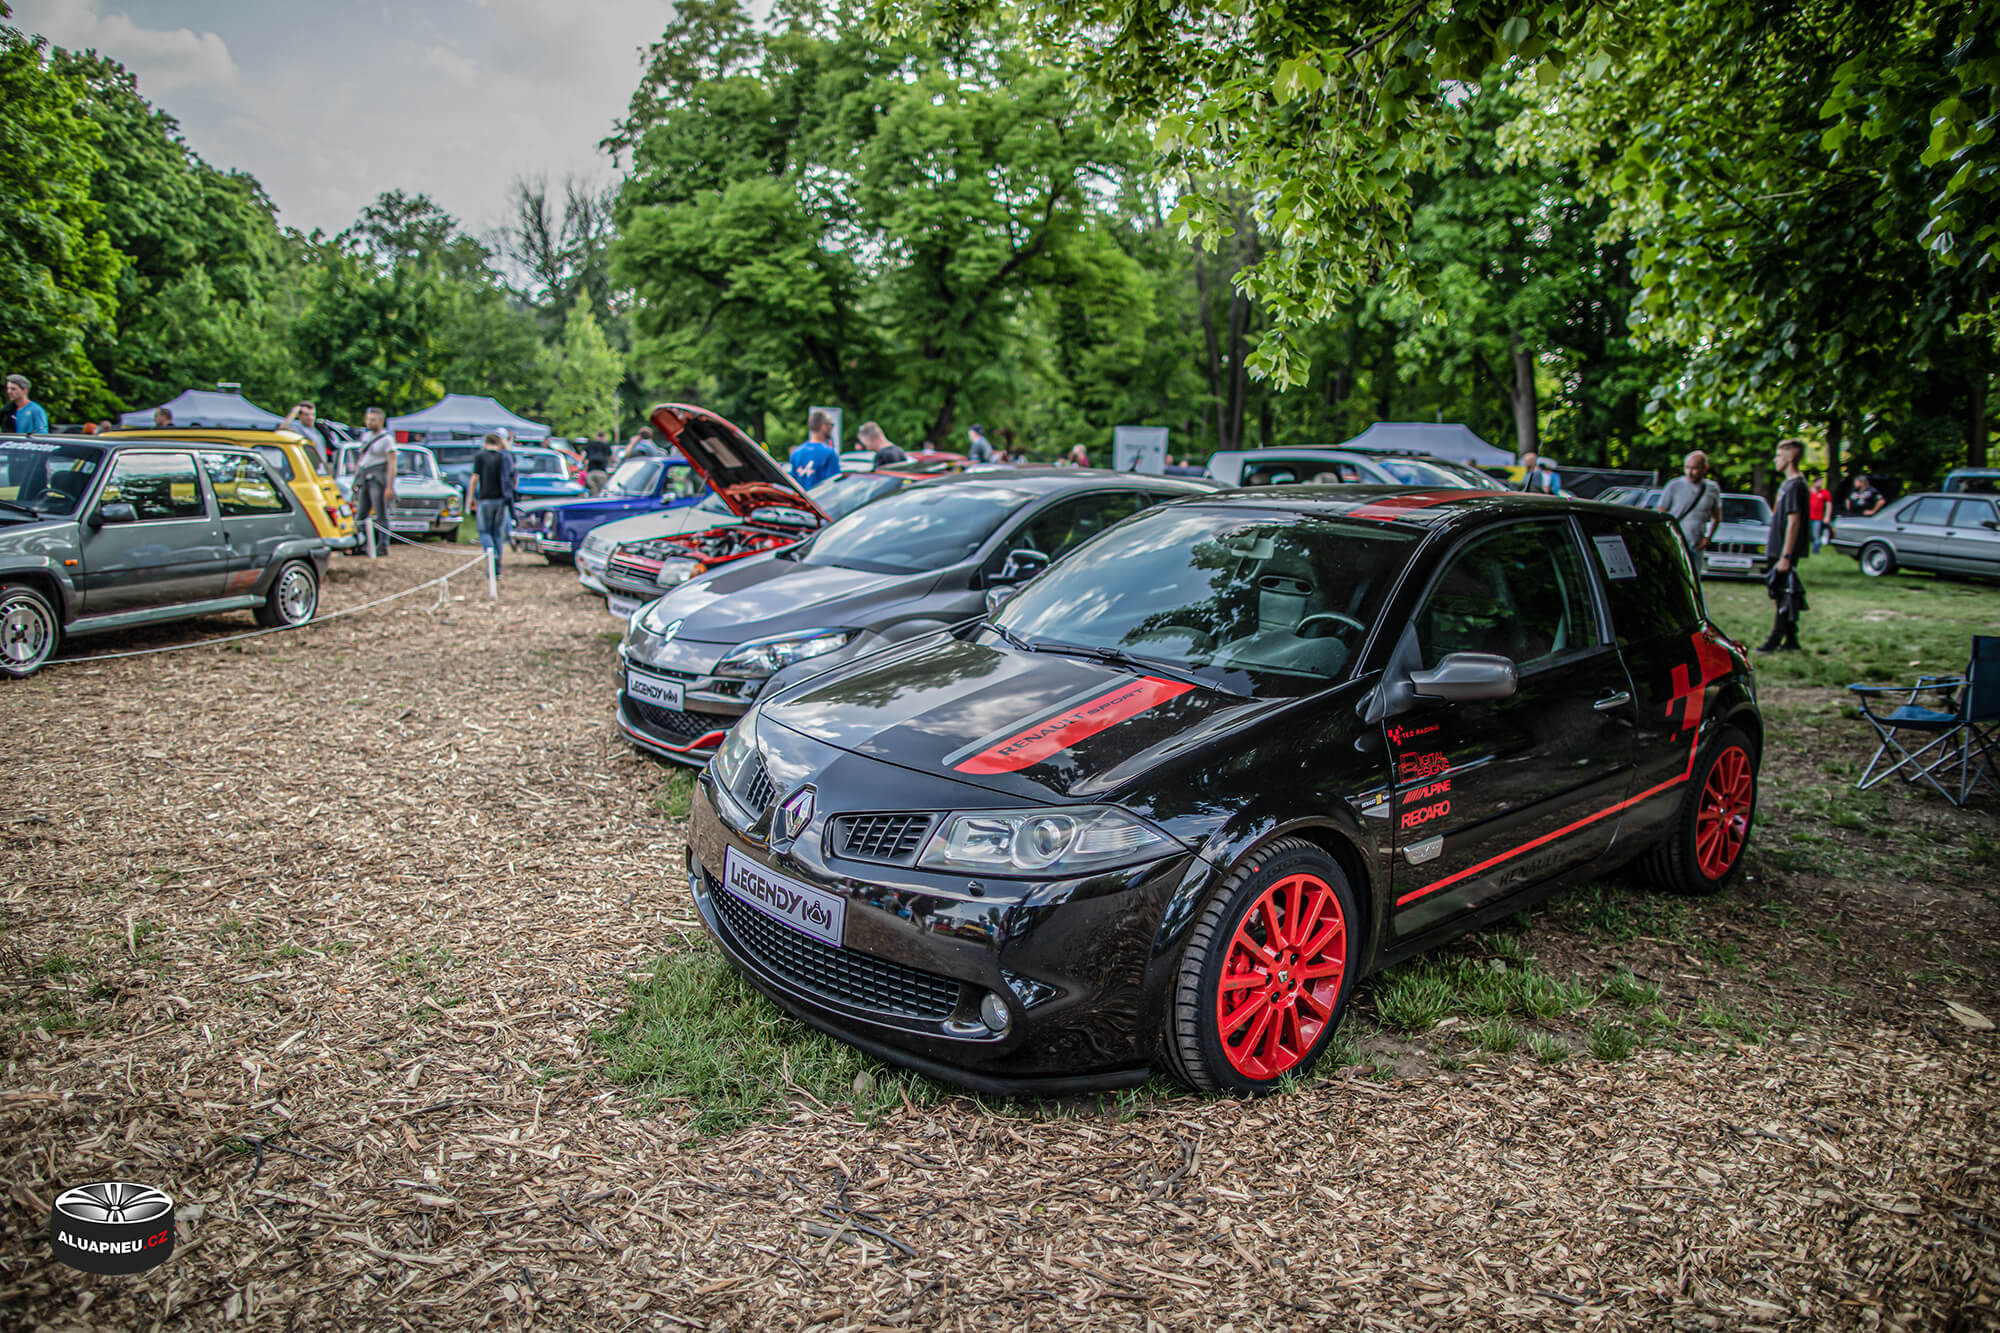 Rudá alu kola Renault Megane Rs  - Automobilové Legendy 2019 - www.aluapneu.cz